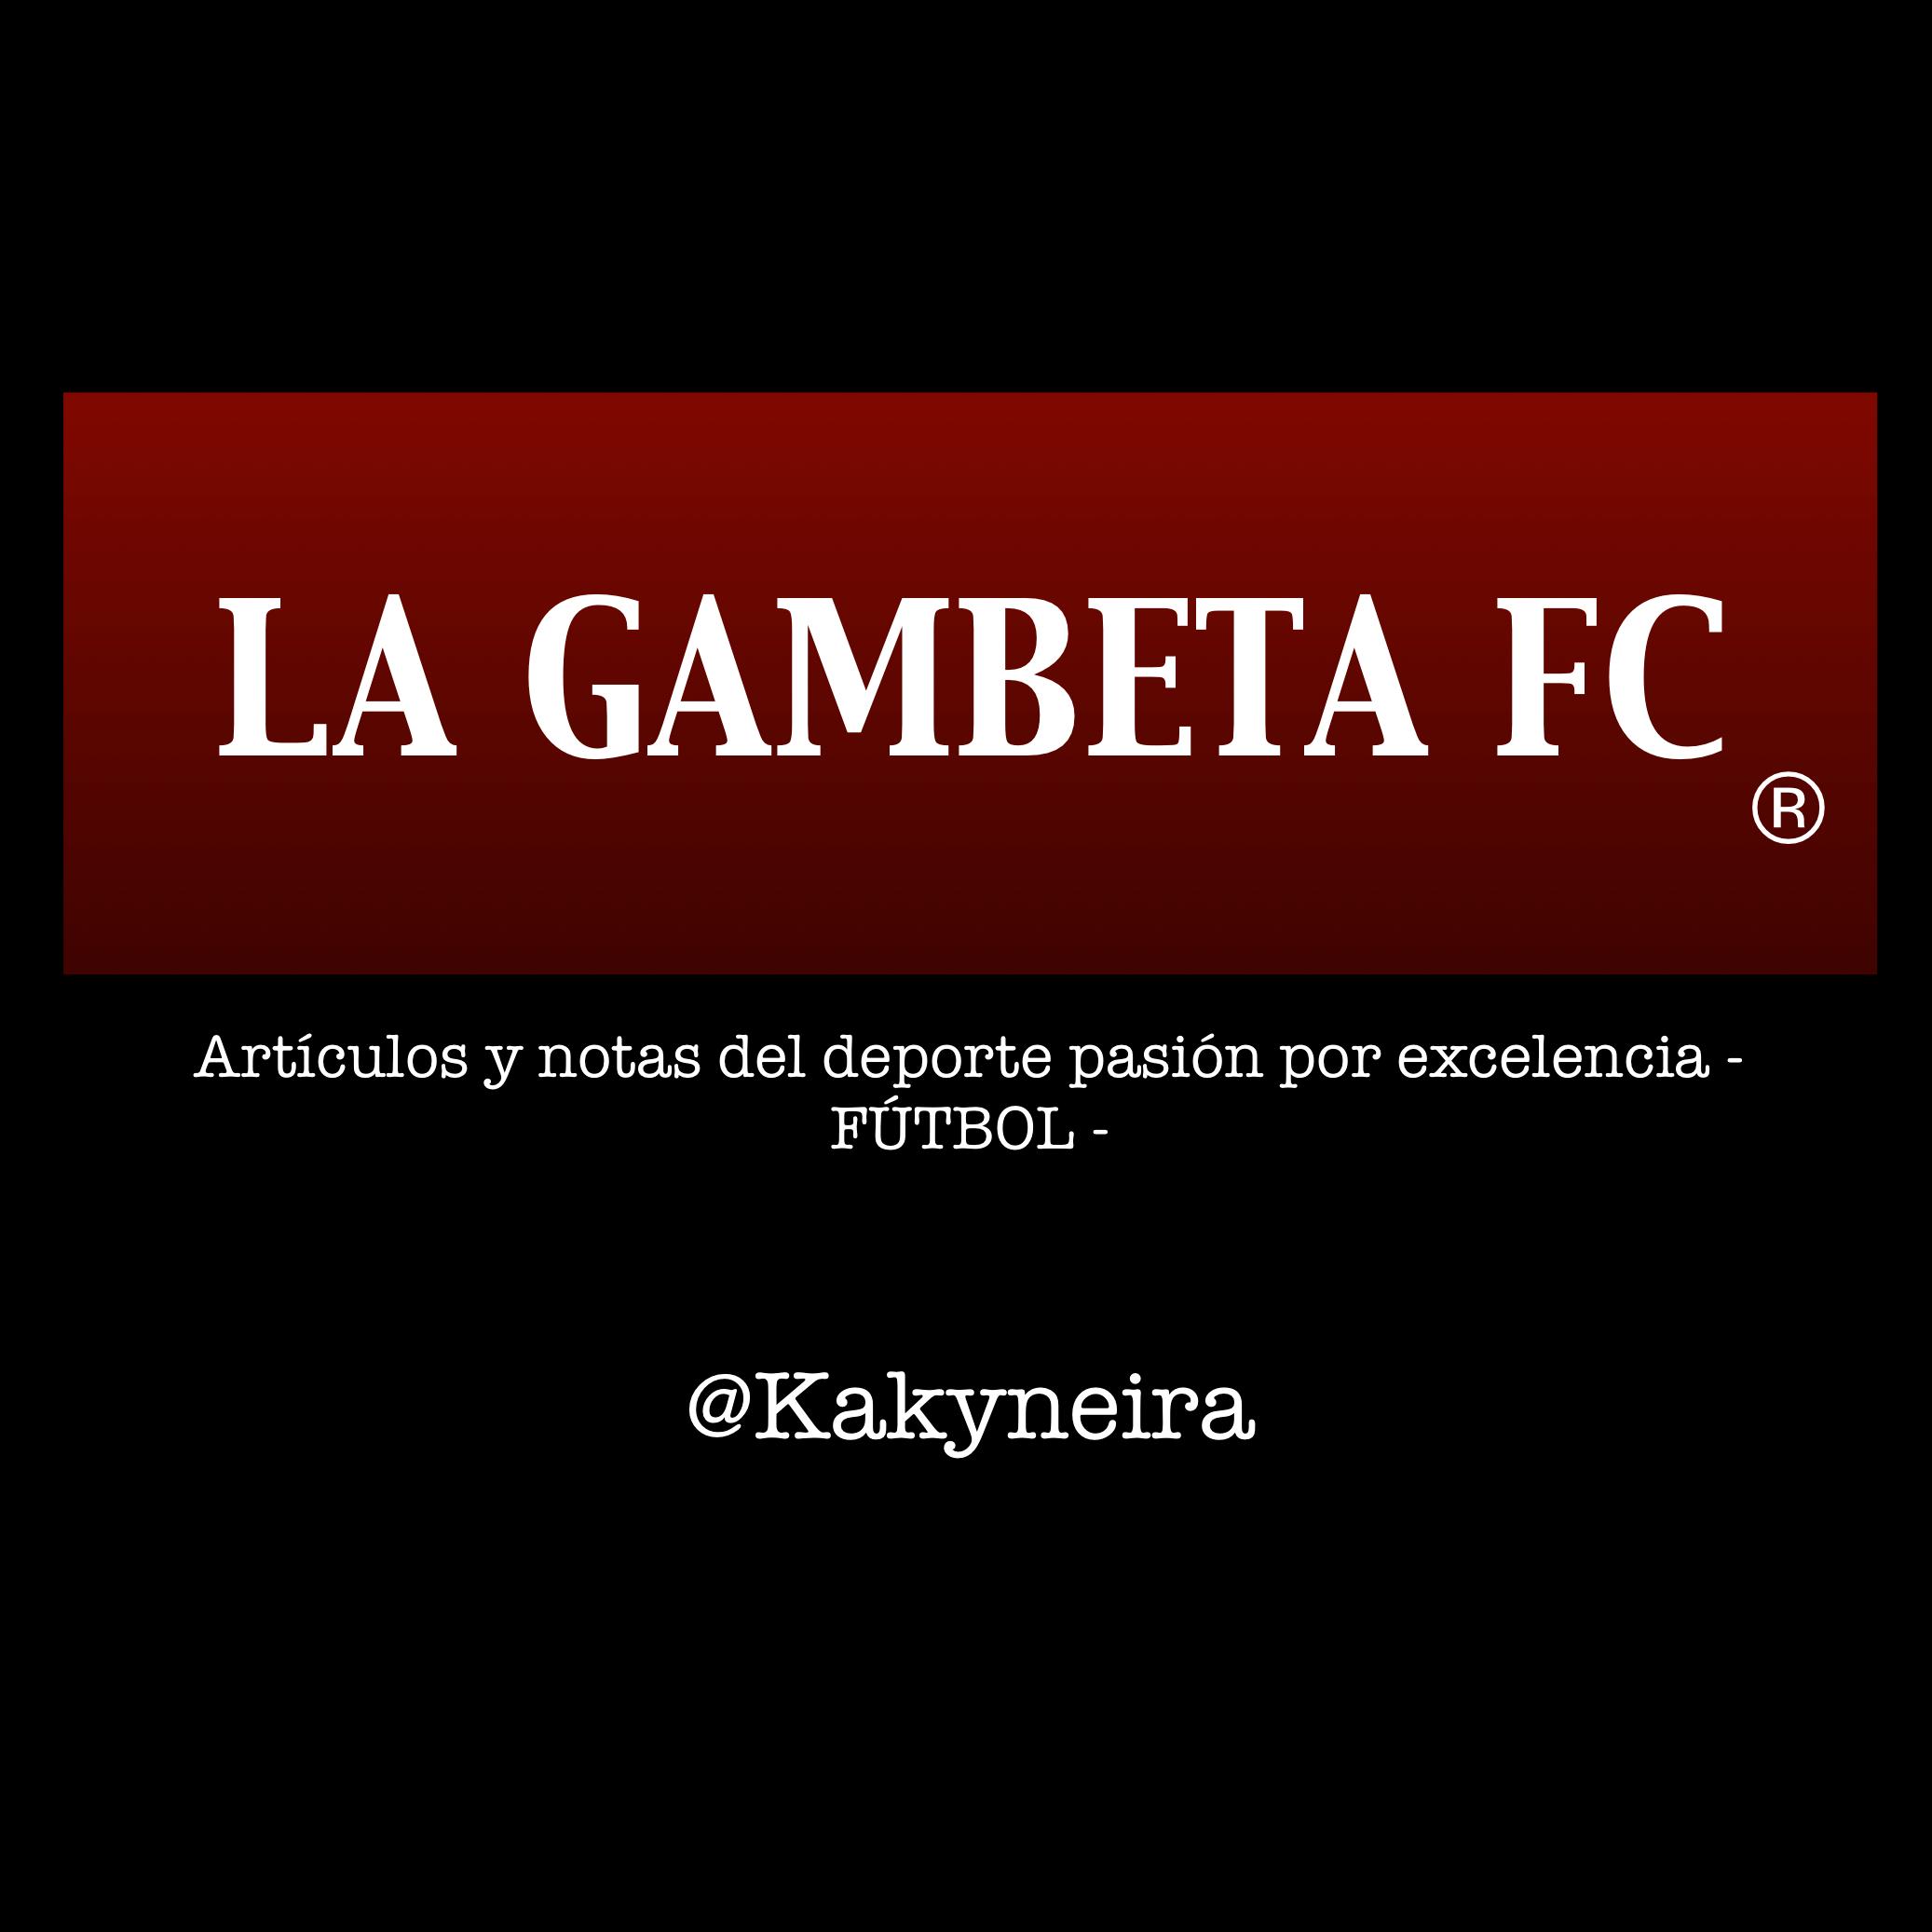 La Gambeta FC